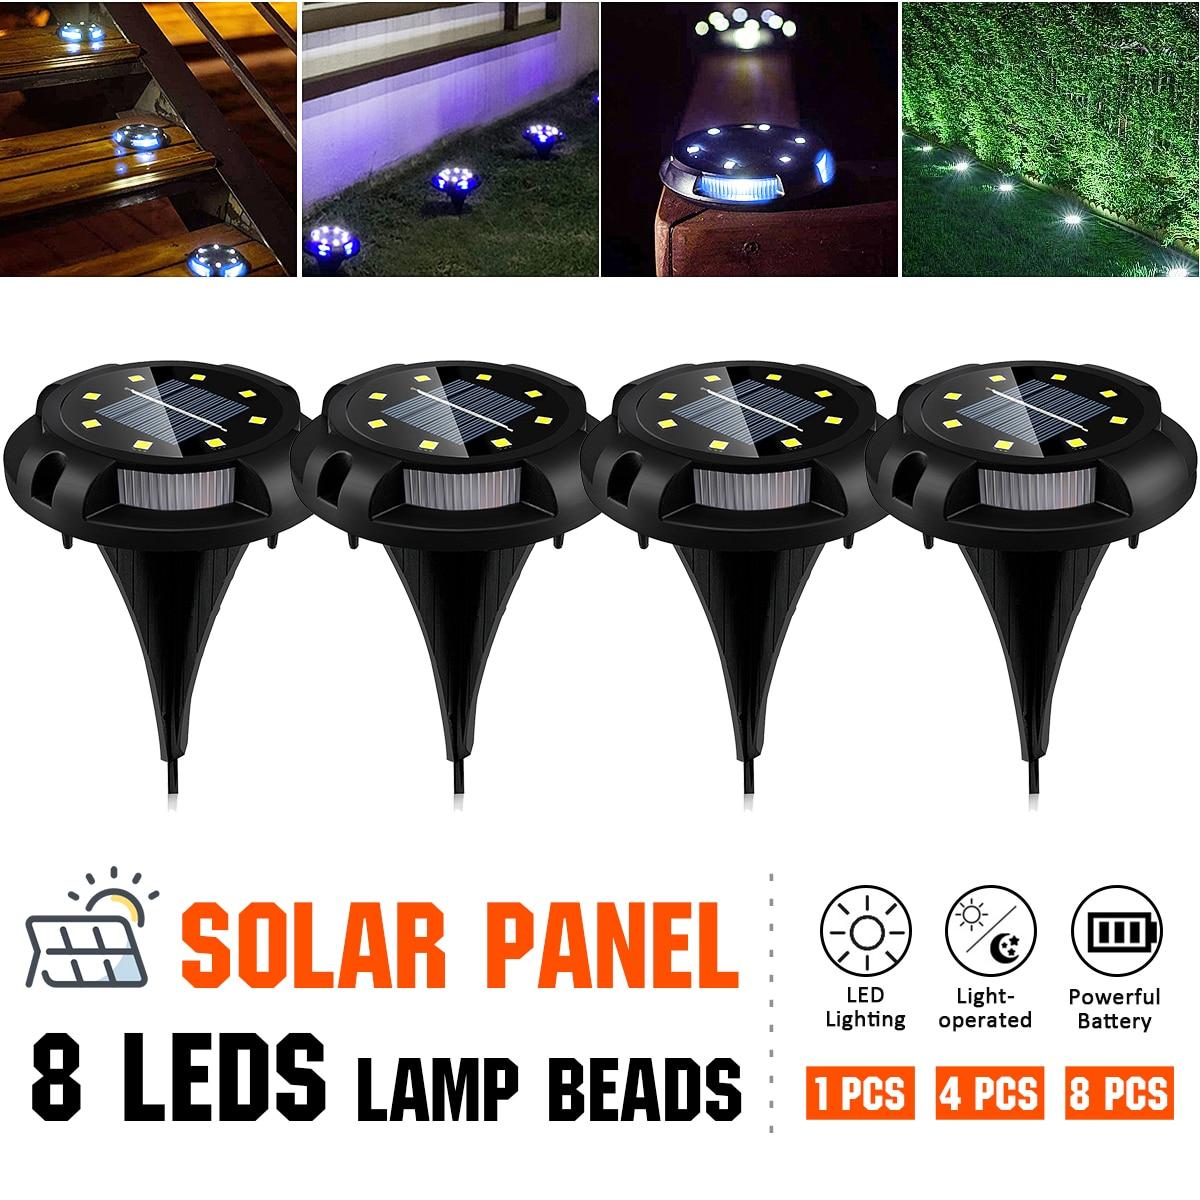 8 LEDs Solar Light Outdoors Solar Lamps for the Garden Terrace IP67 Waterproof In-Ground Light Warm White/Blue Street Lights